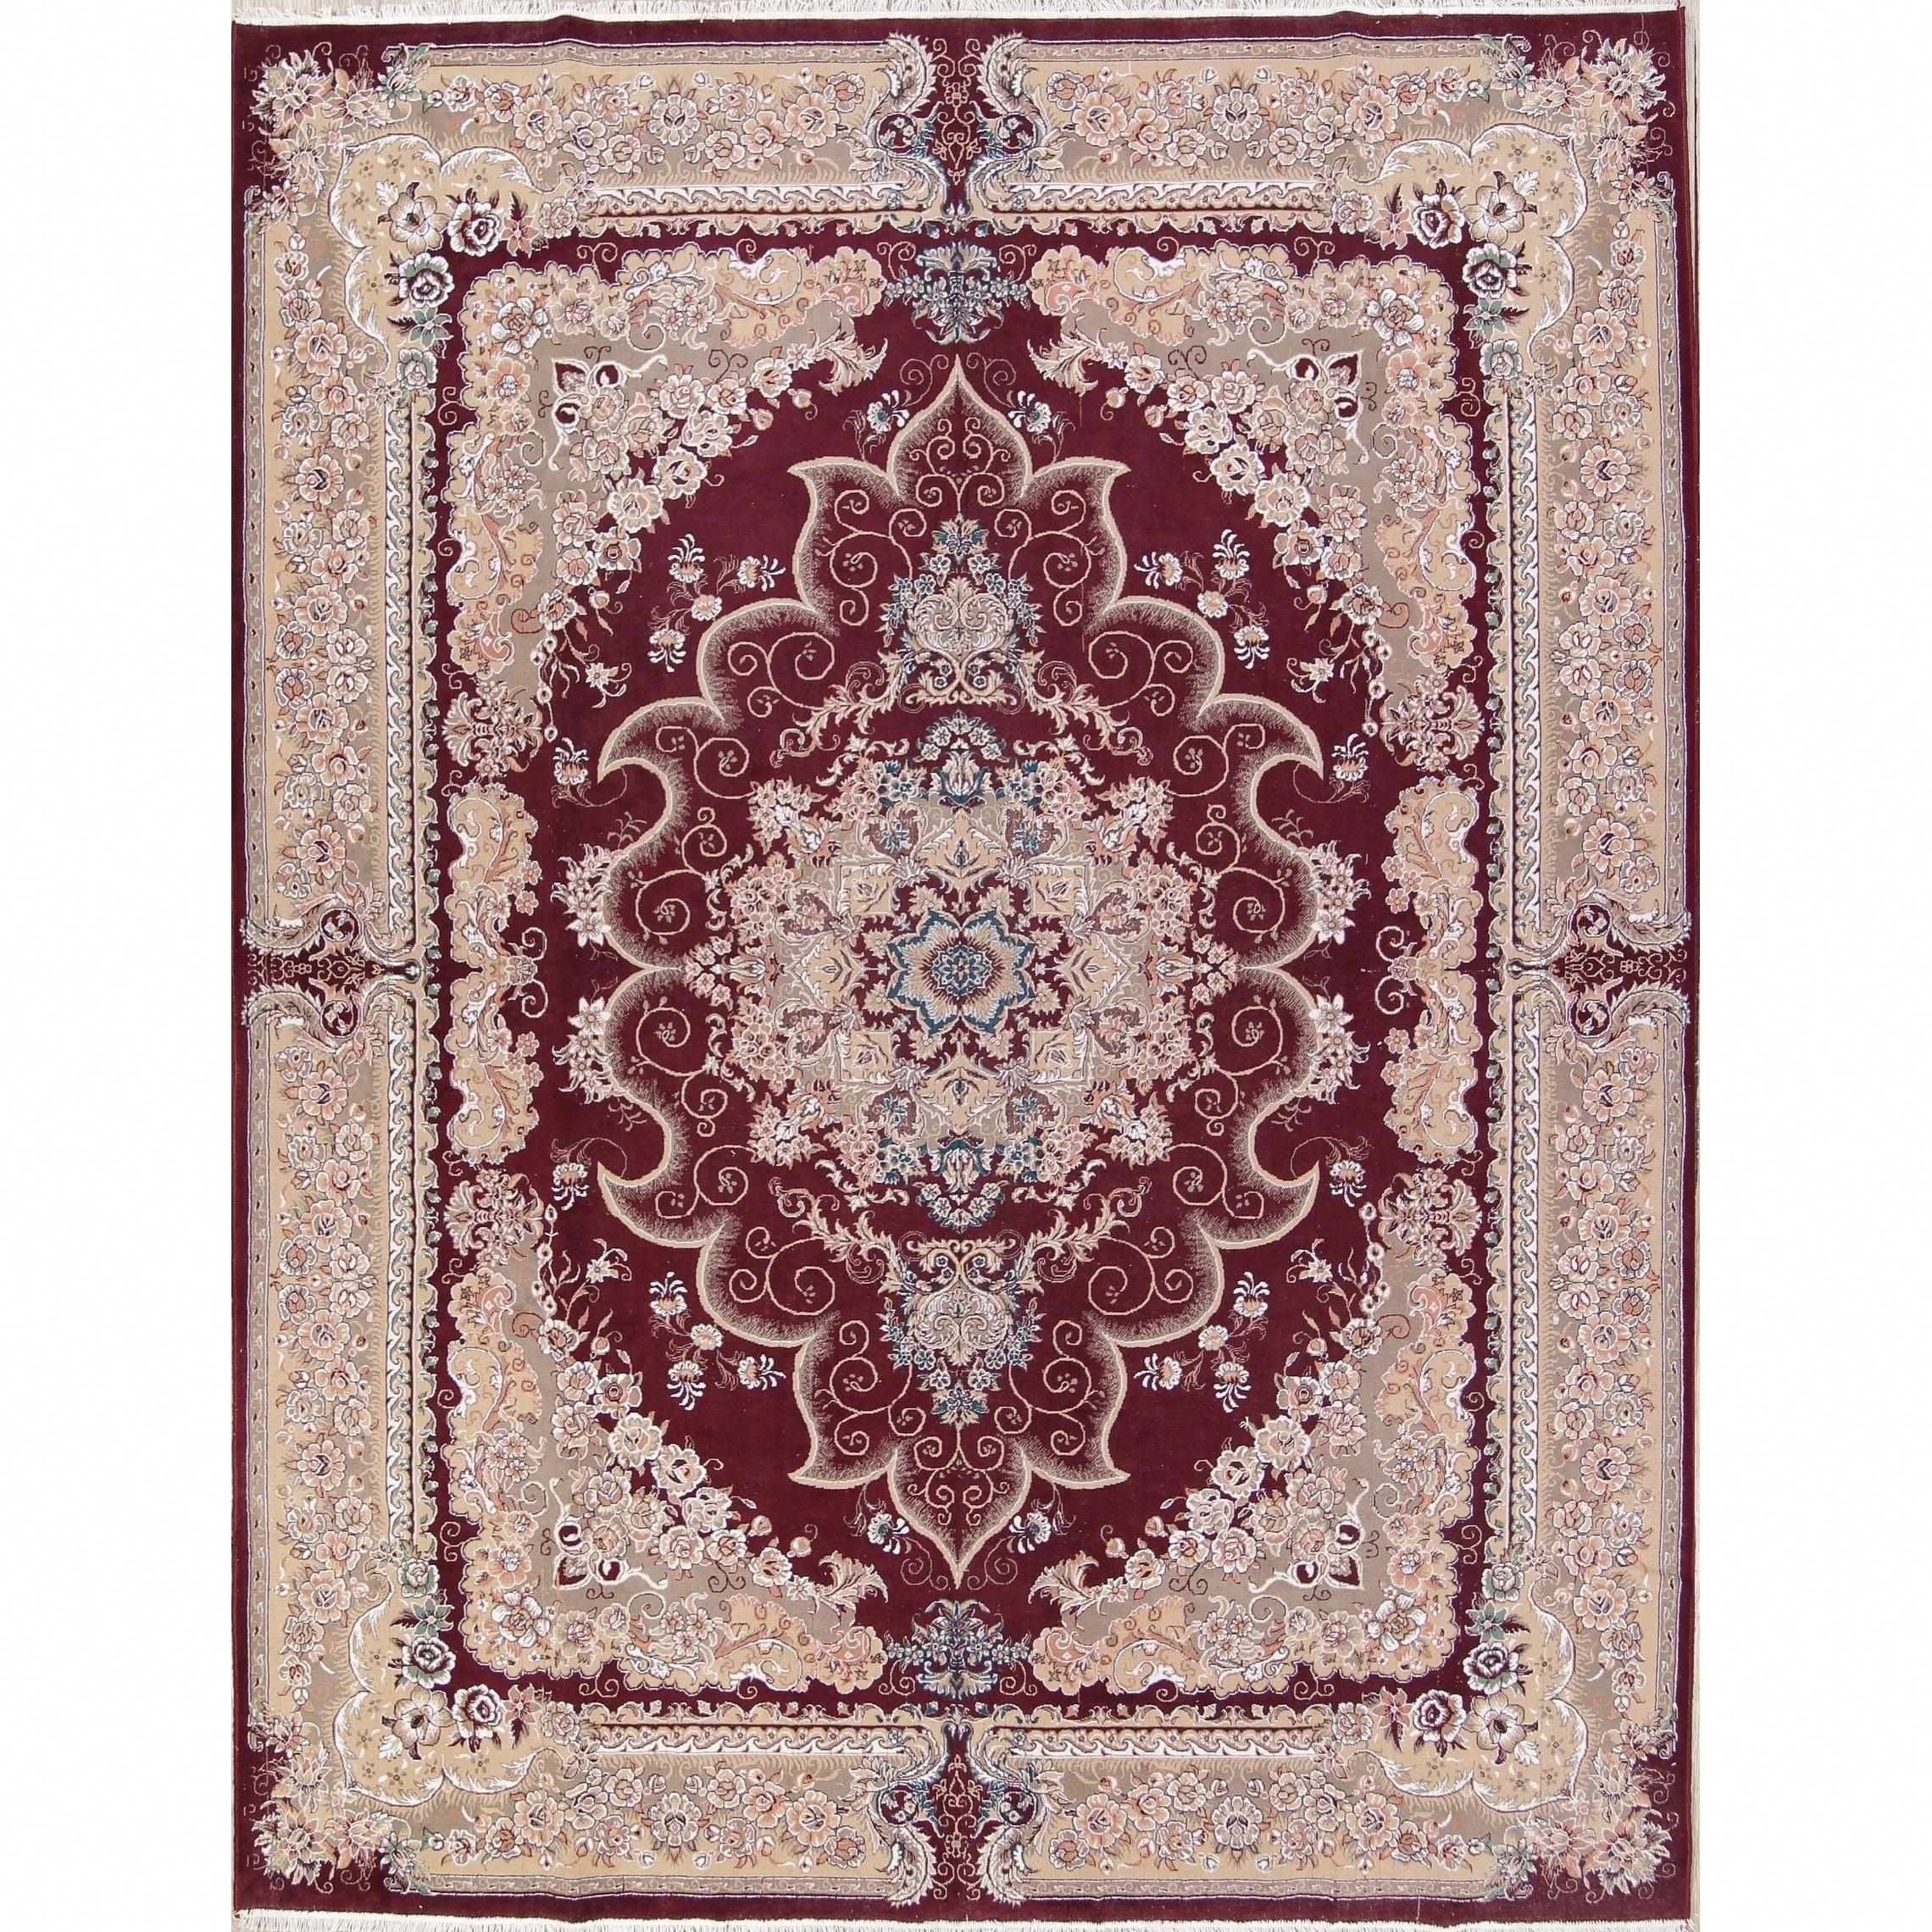 Carpet Runners By The Foot Lowes Pinkcarpetrunnerrental Referral   Lowes Carpet Runners By The Foot   Persian Carpet   Beige Carpet   Heriz Rug   Kilim Rugs   Stairs